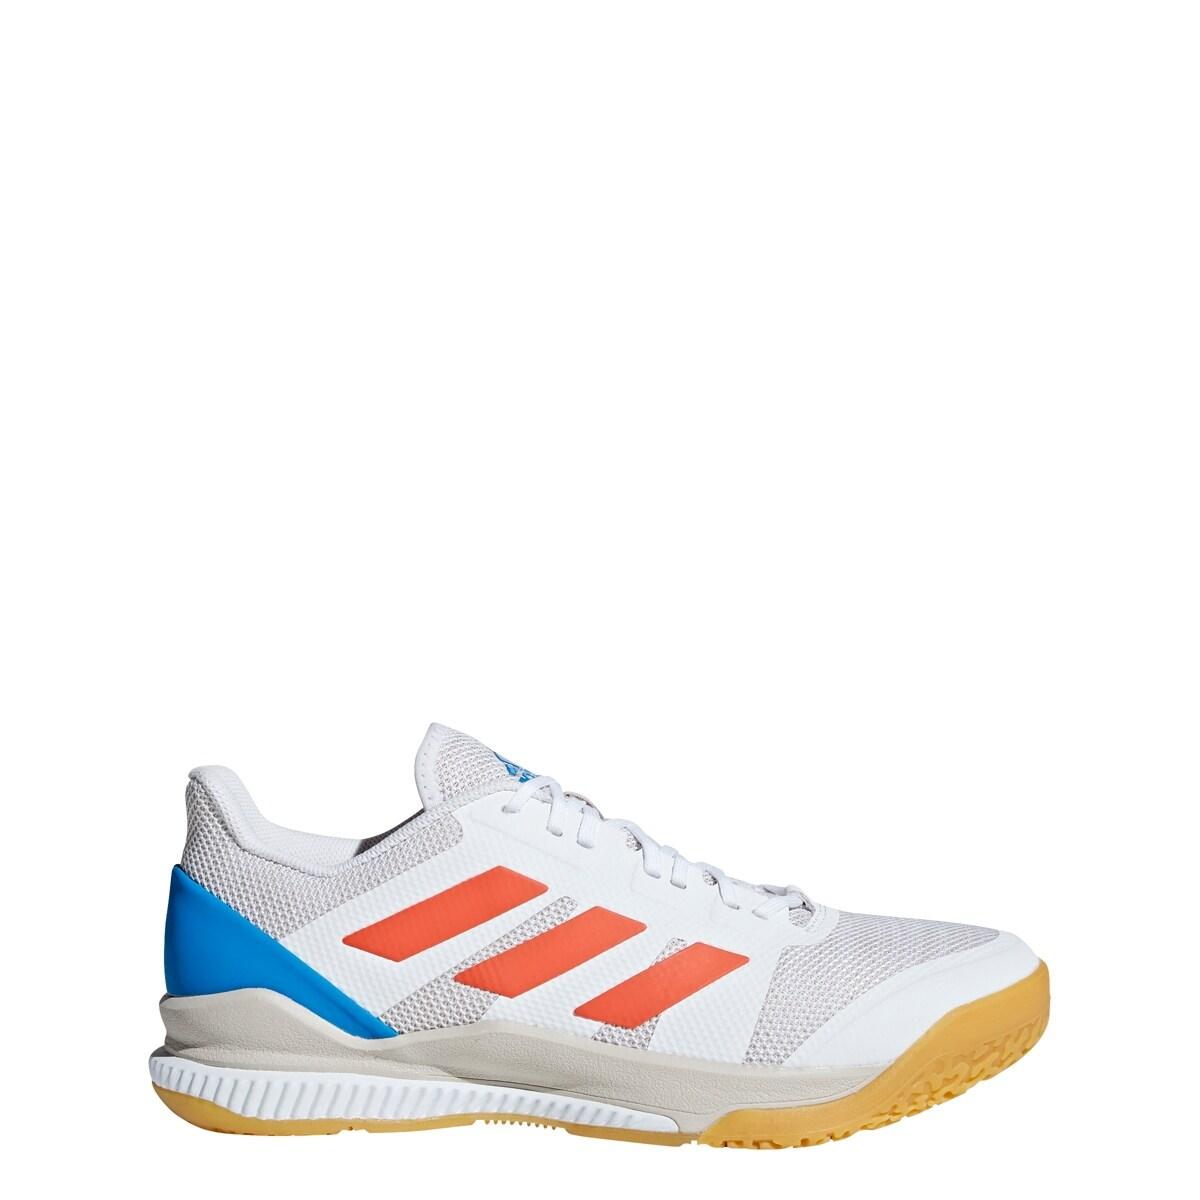 Adidas Stabil Bounce Shoe Men's Handball